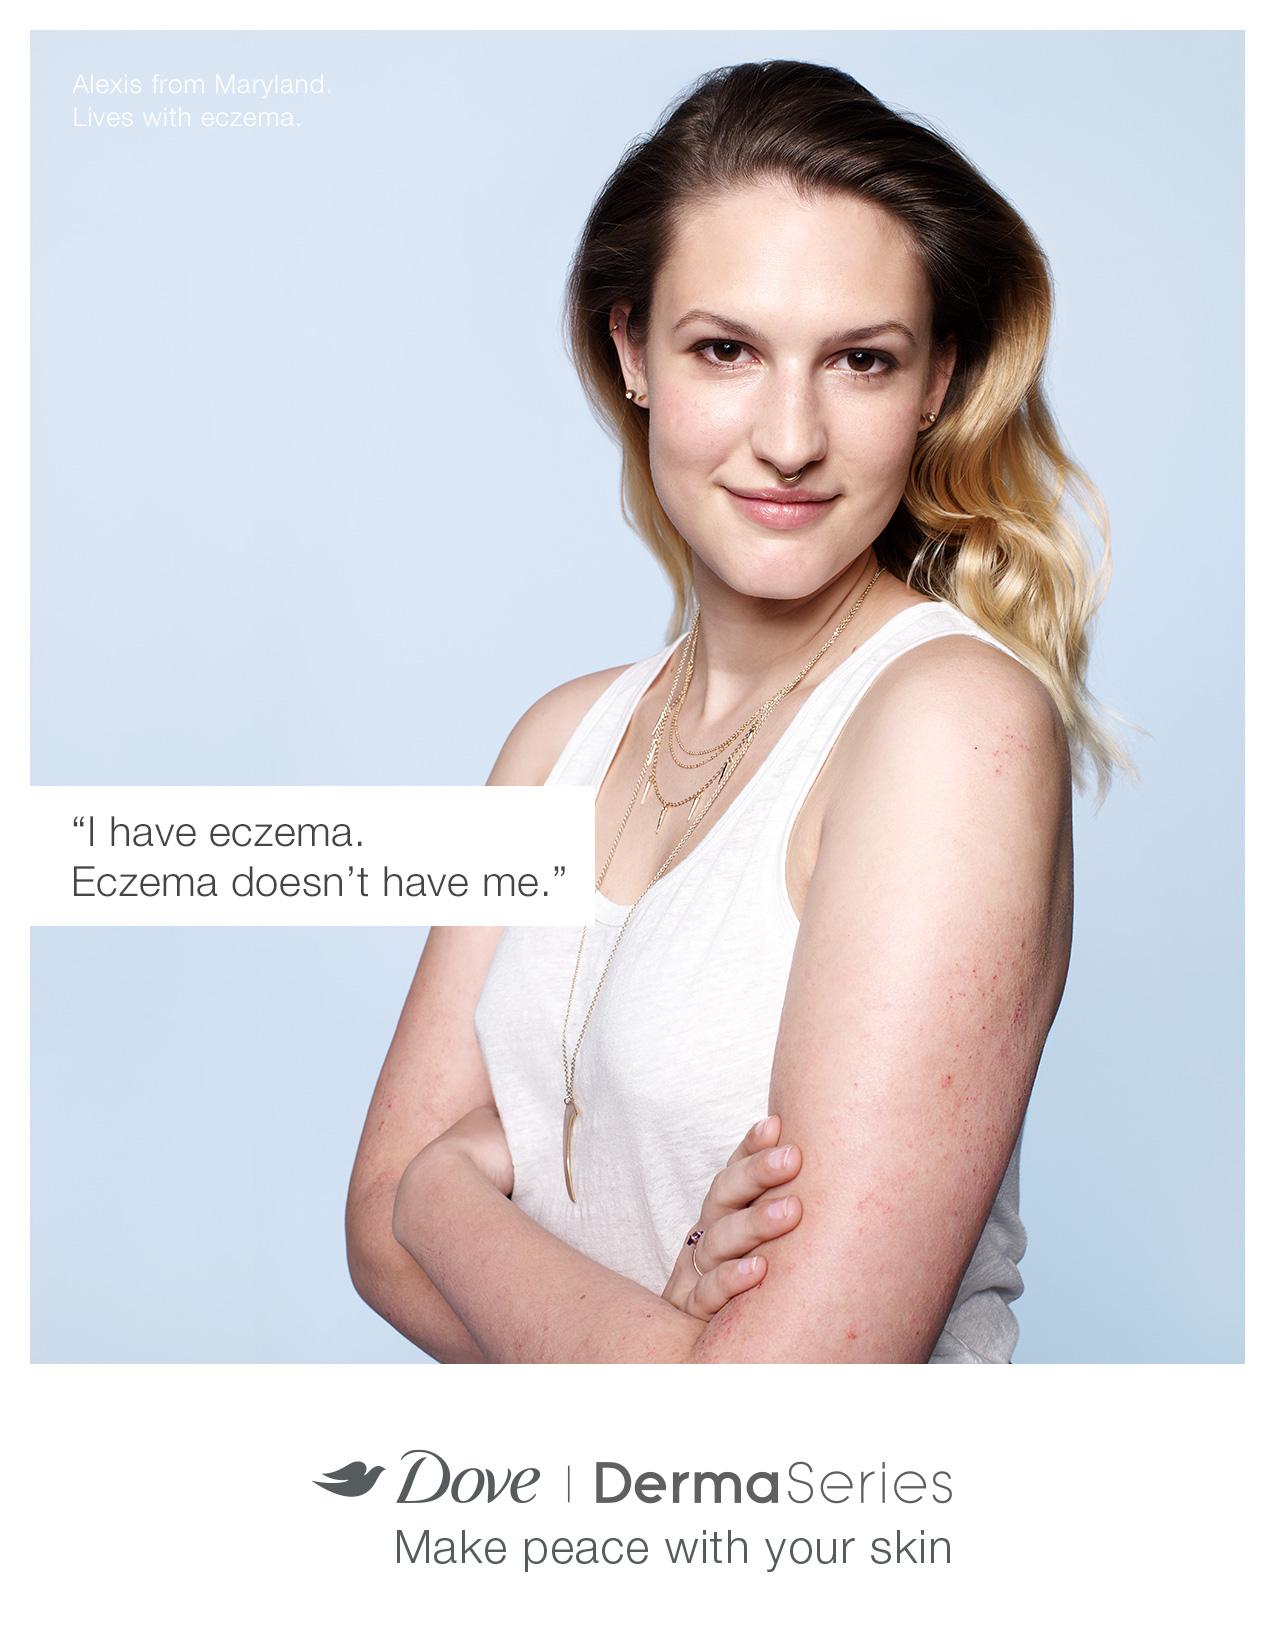 Talent_Alexis-Quote